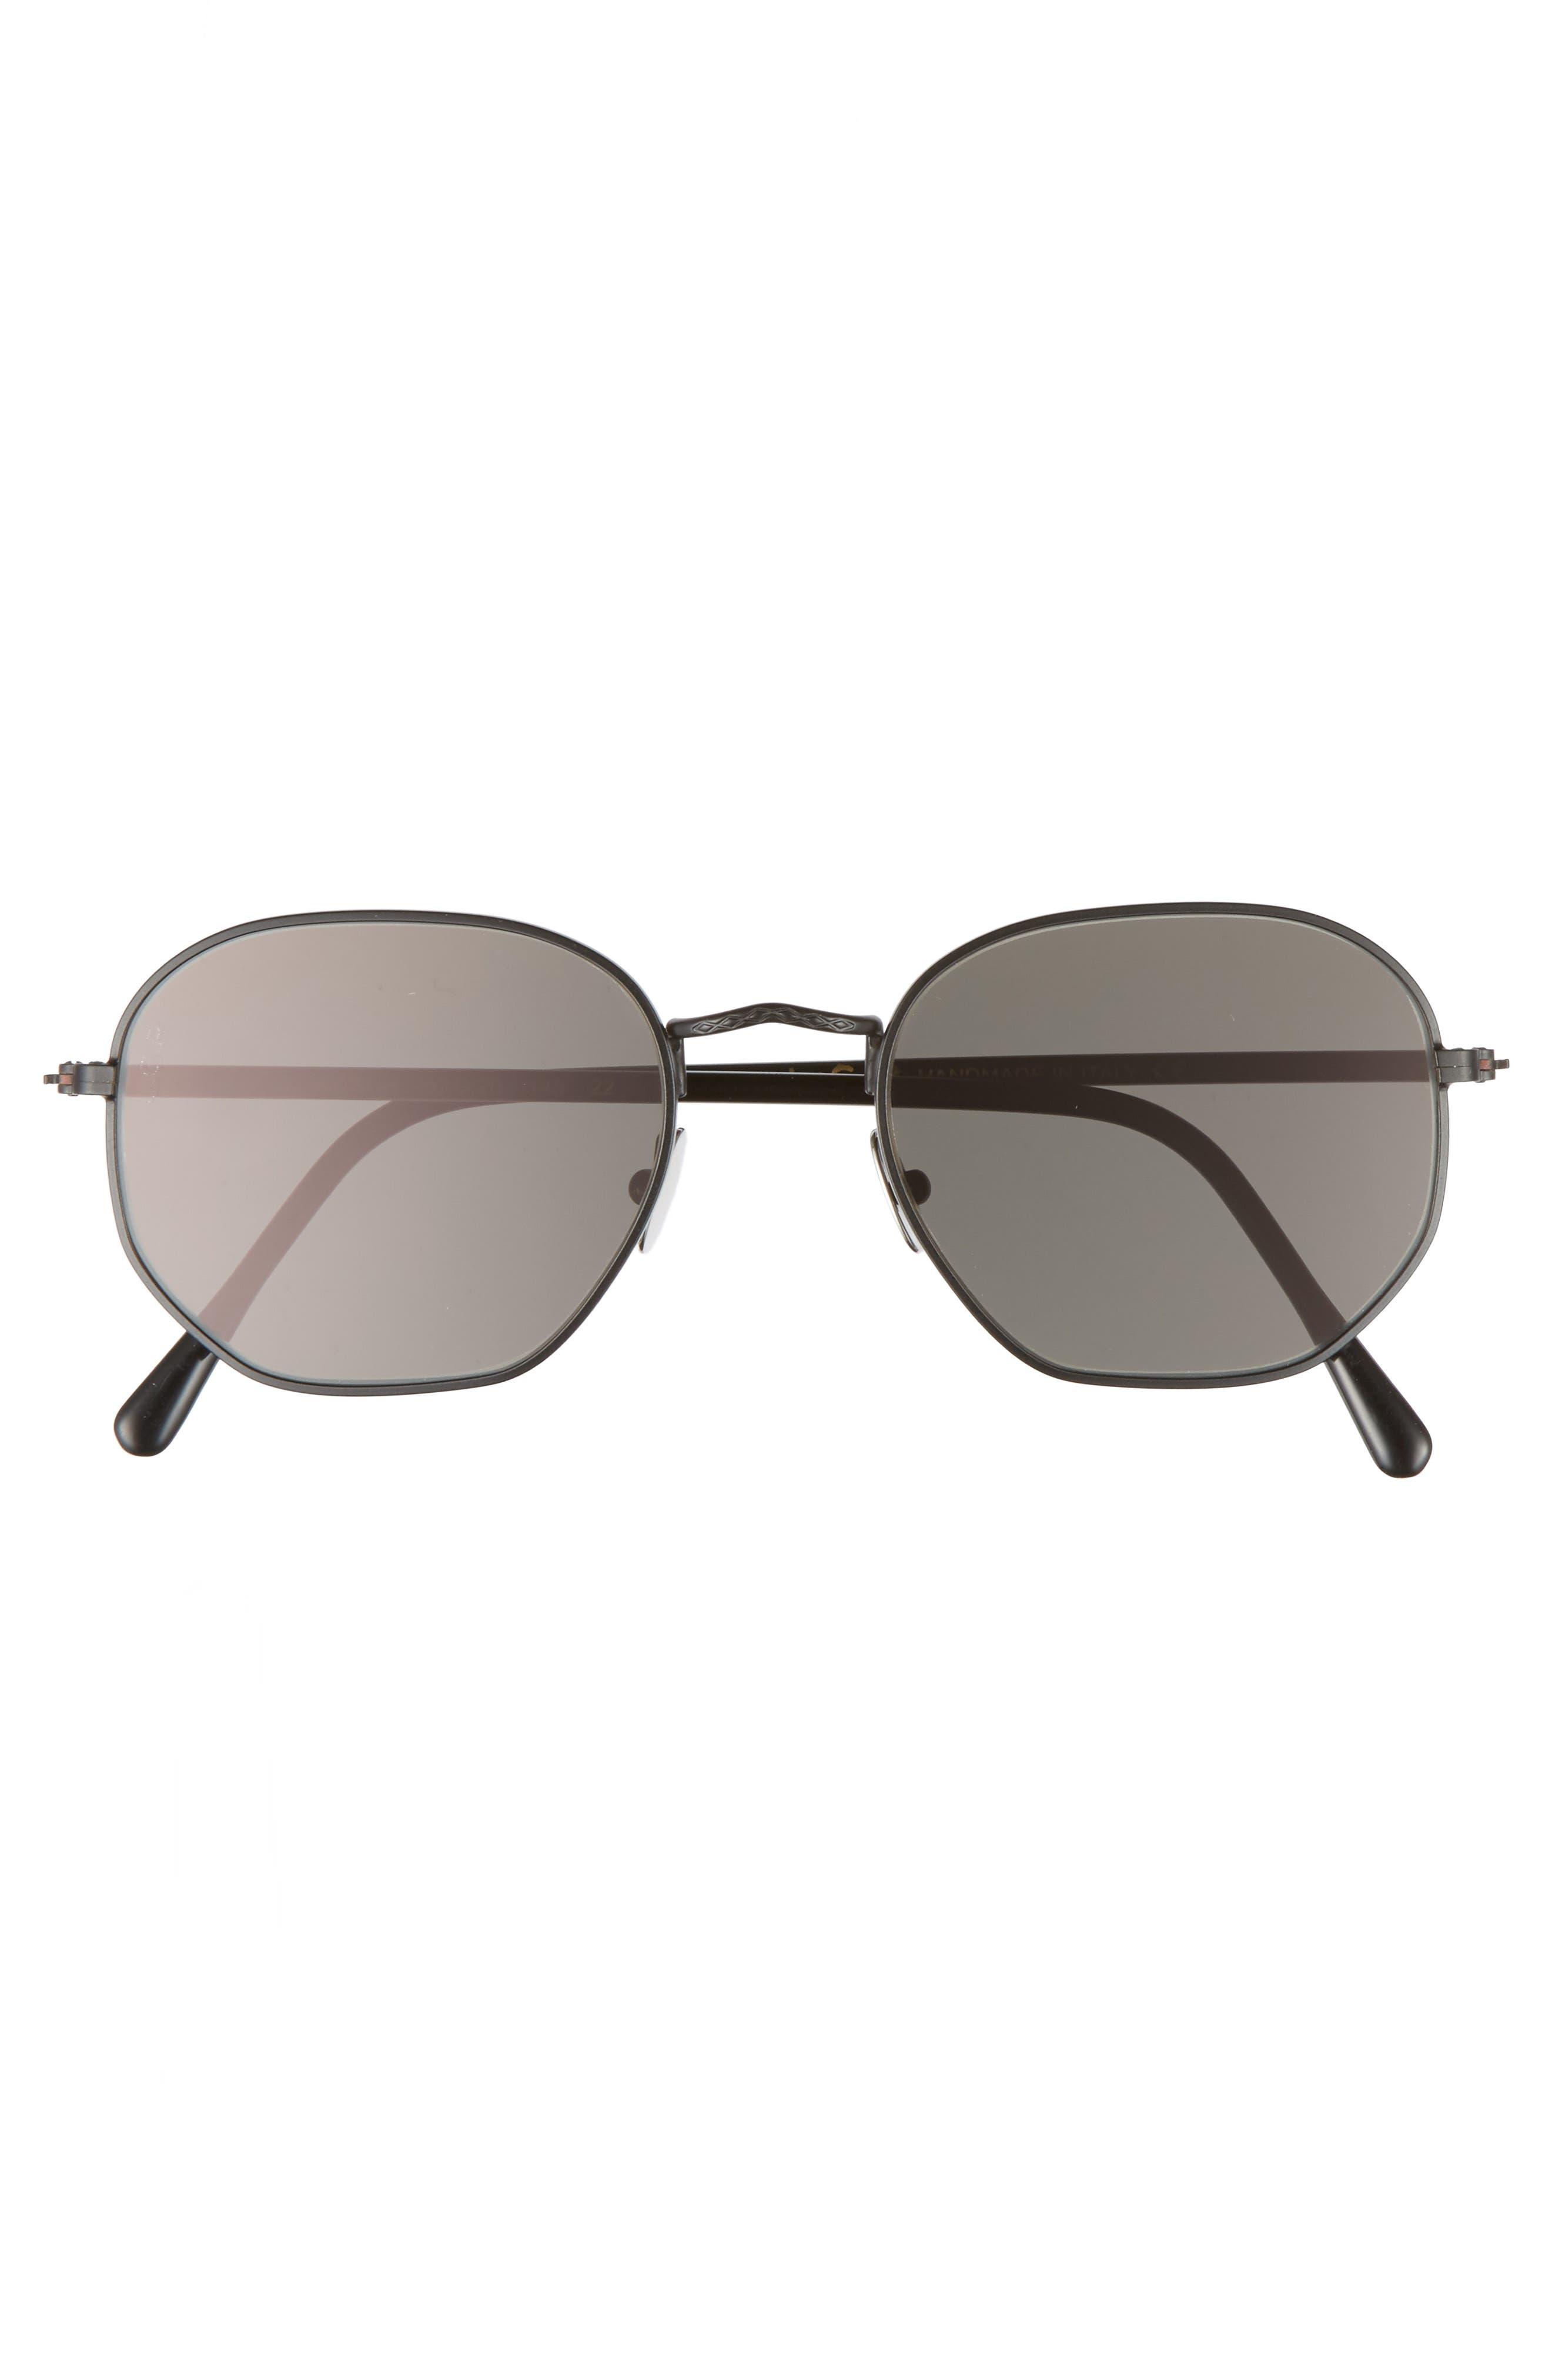 Wilson 52mm Sunglasses,                             Alternate thumbnail 2, color,                             Black Matte/ Grey